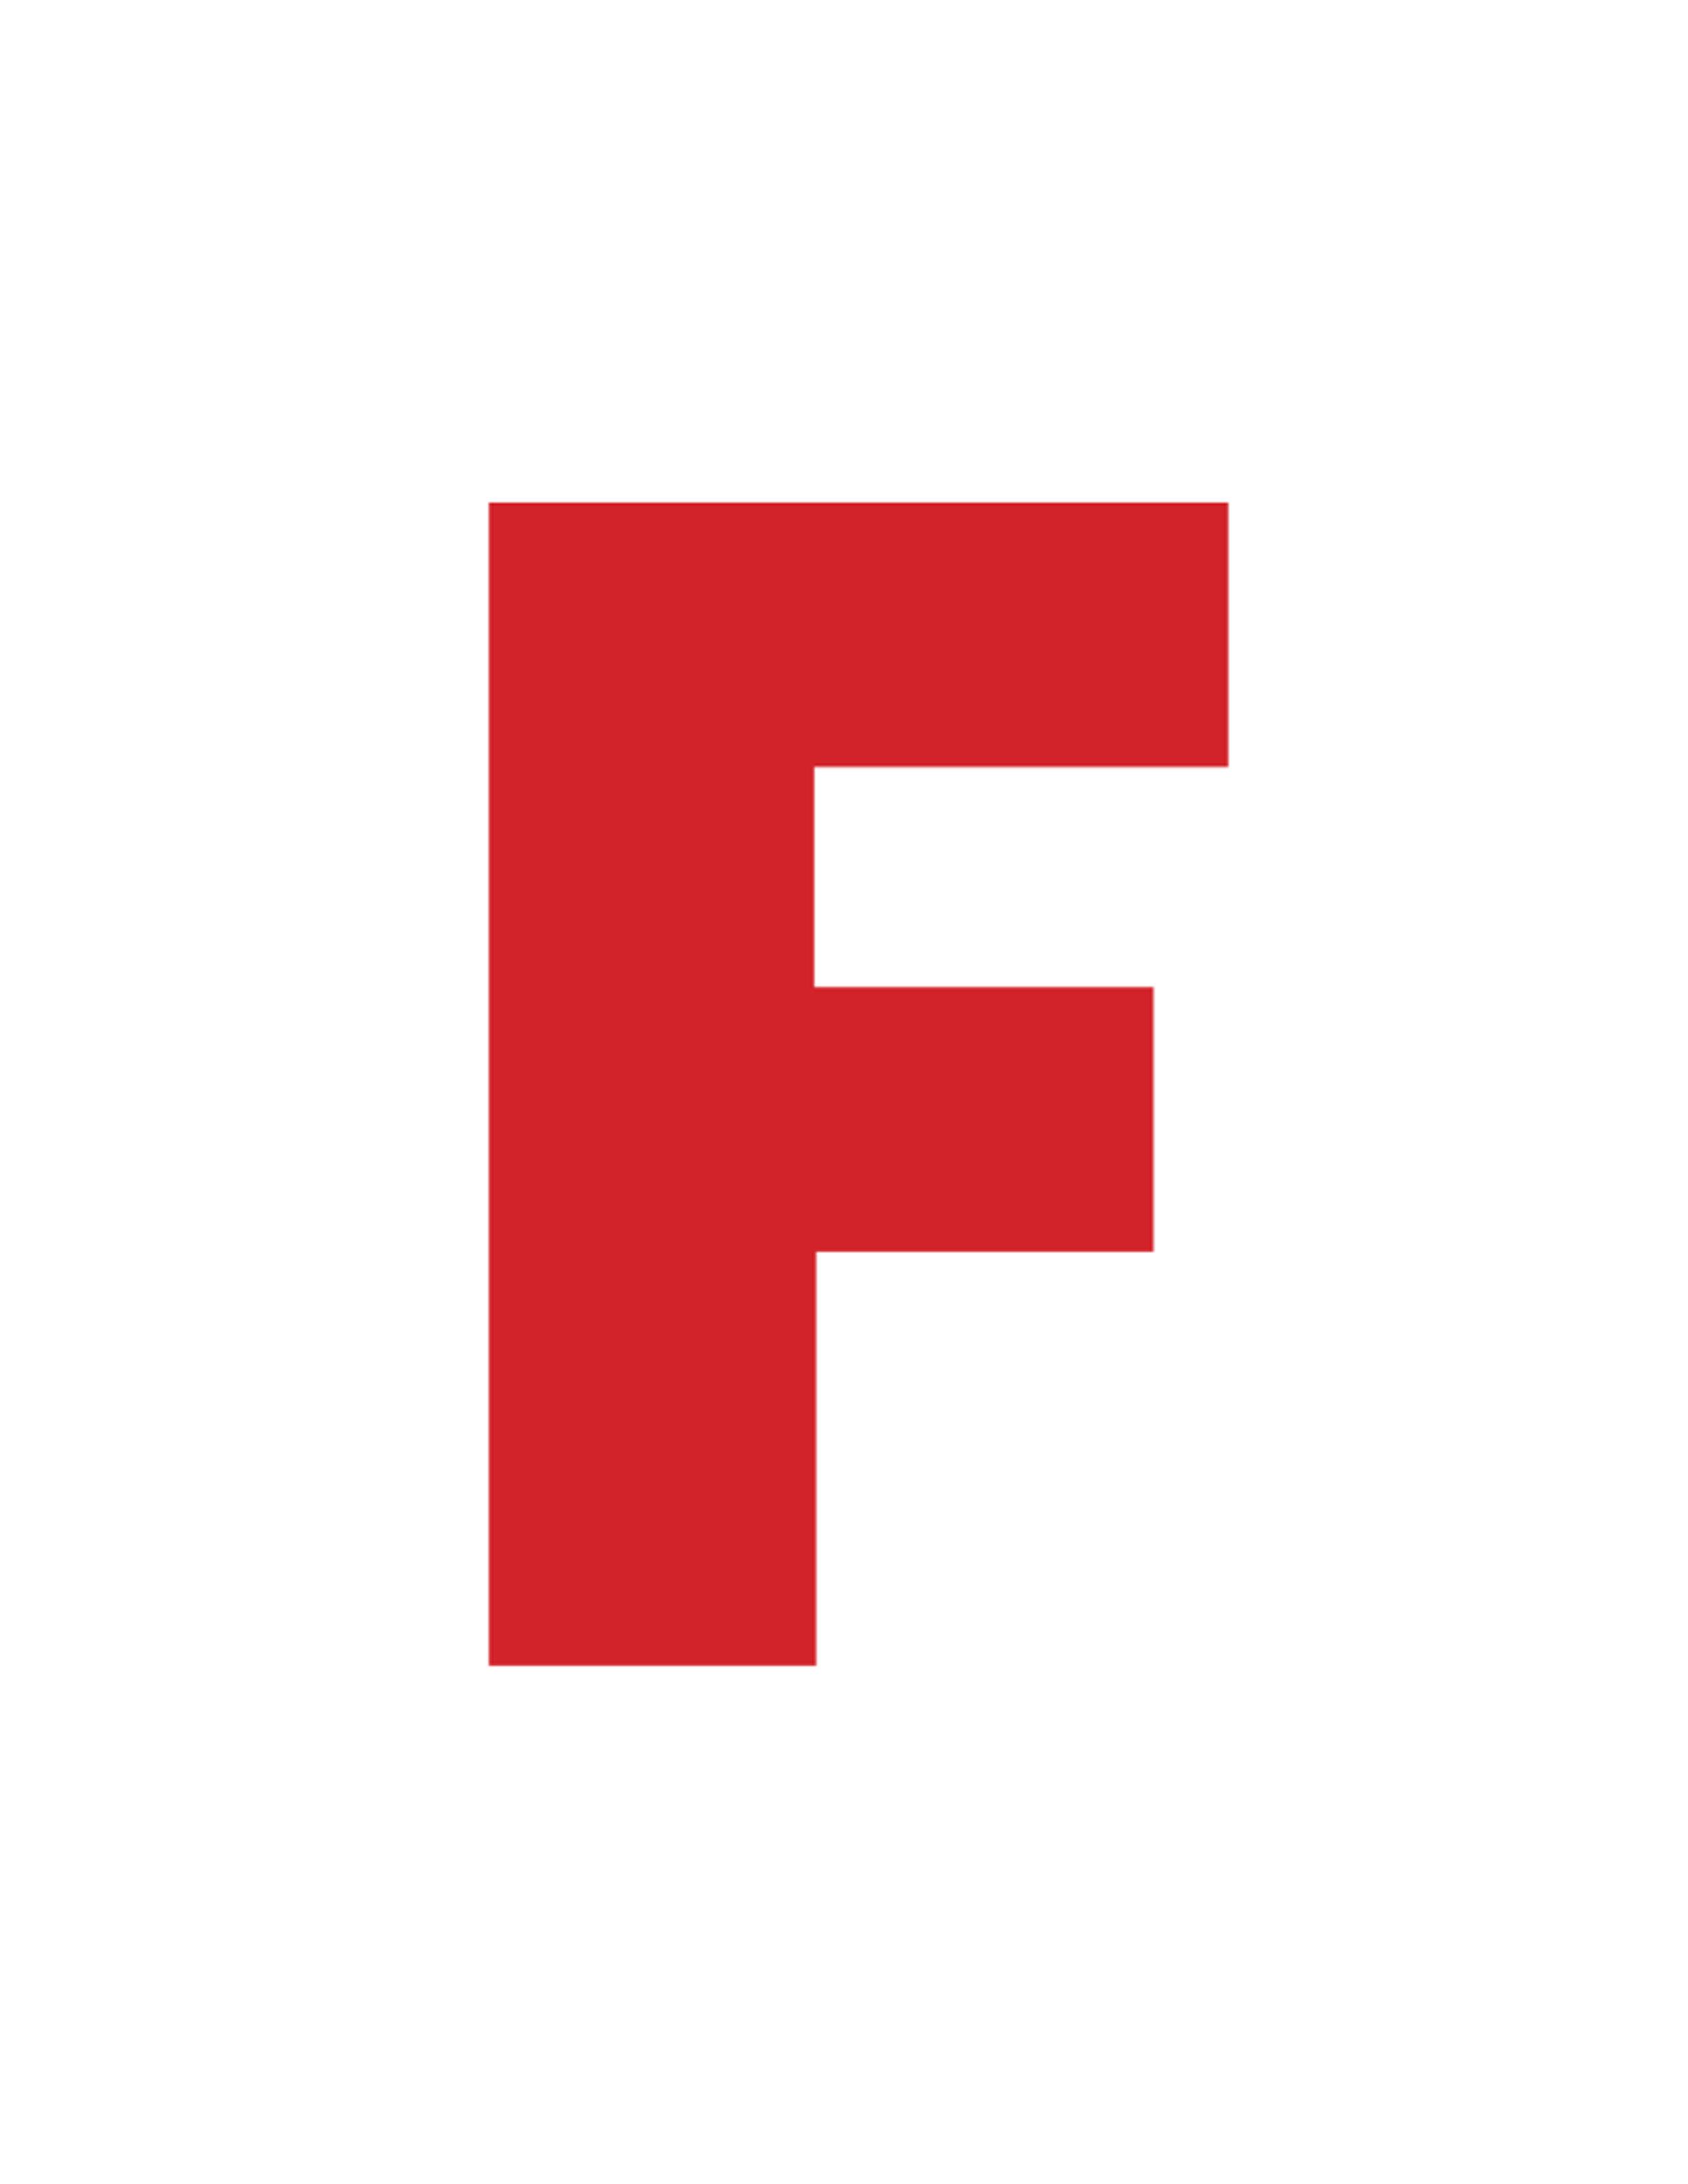 F_3_cover.jpg